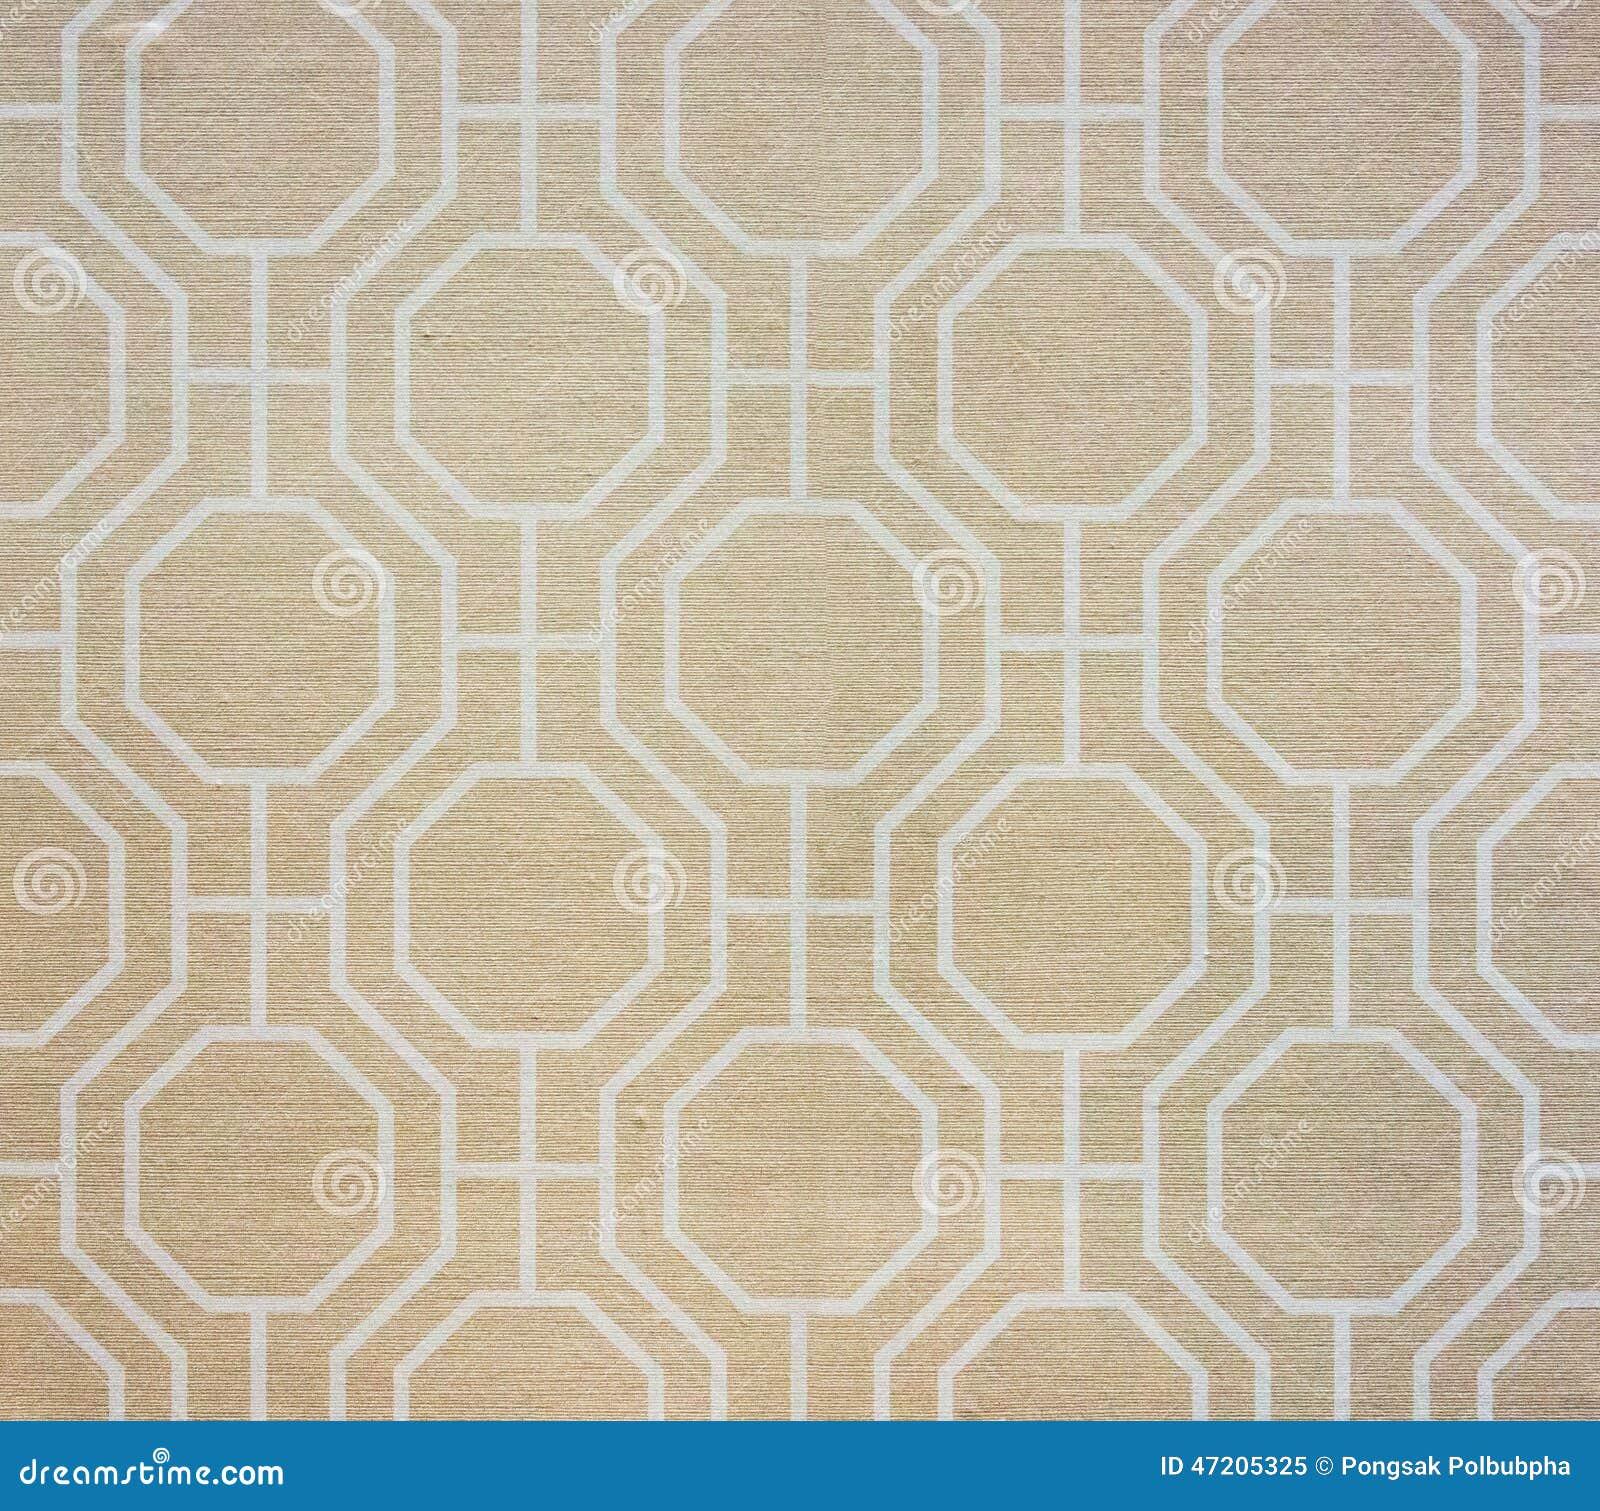 Geometry wallpaper